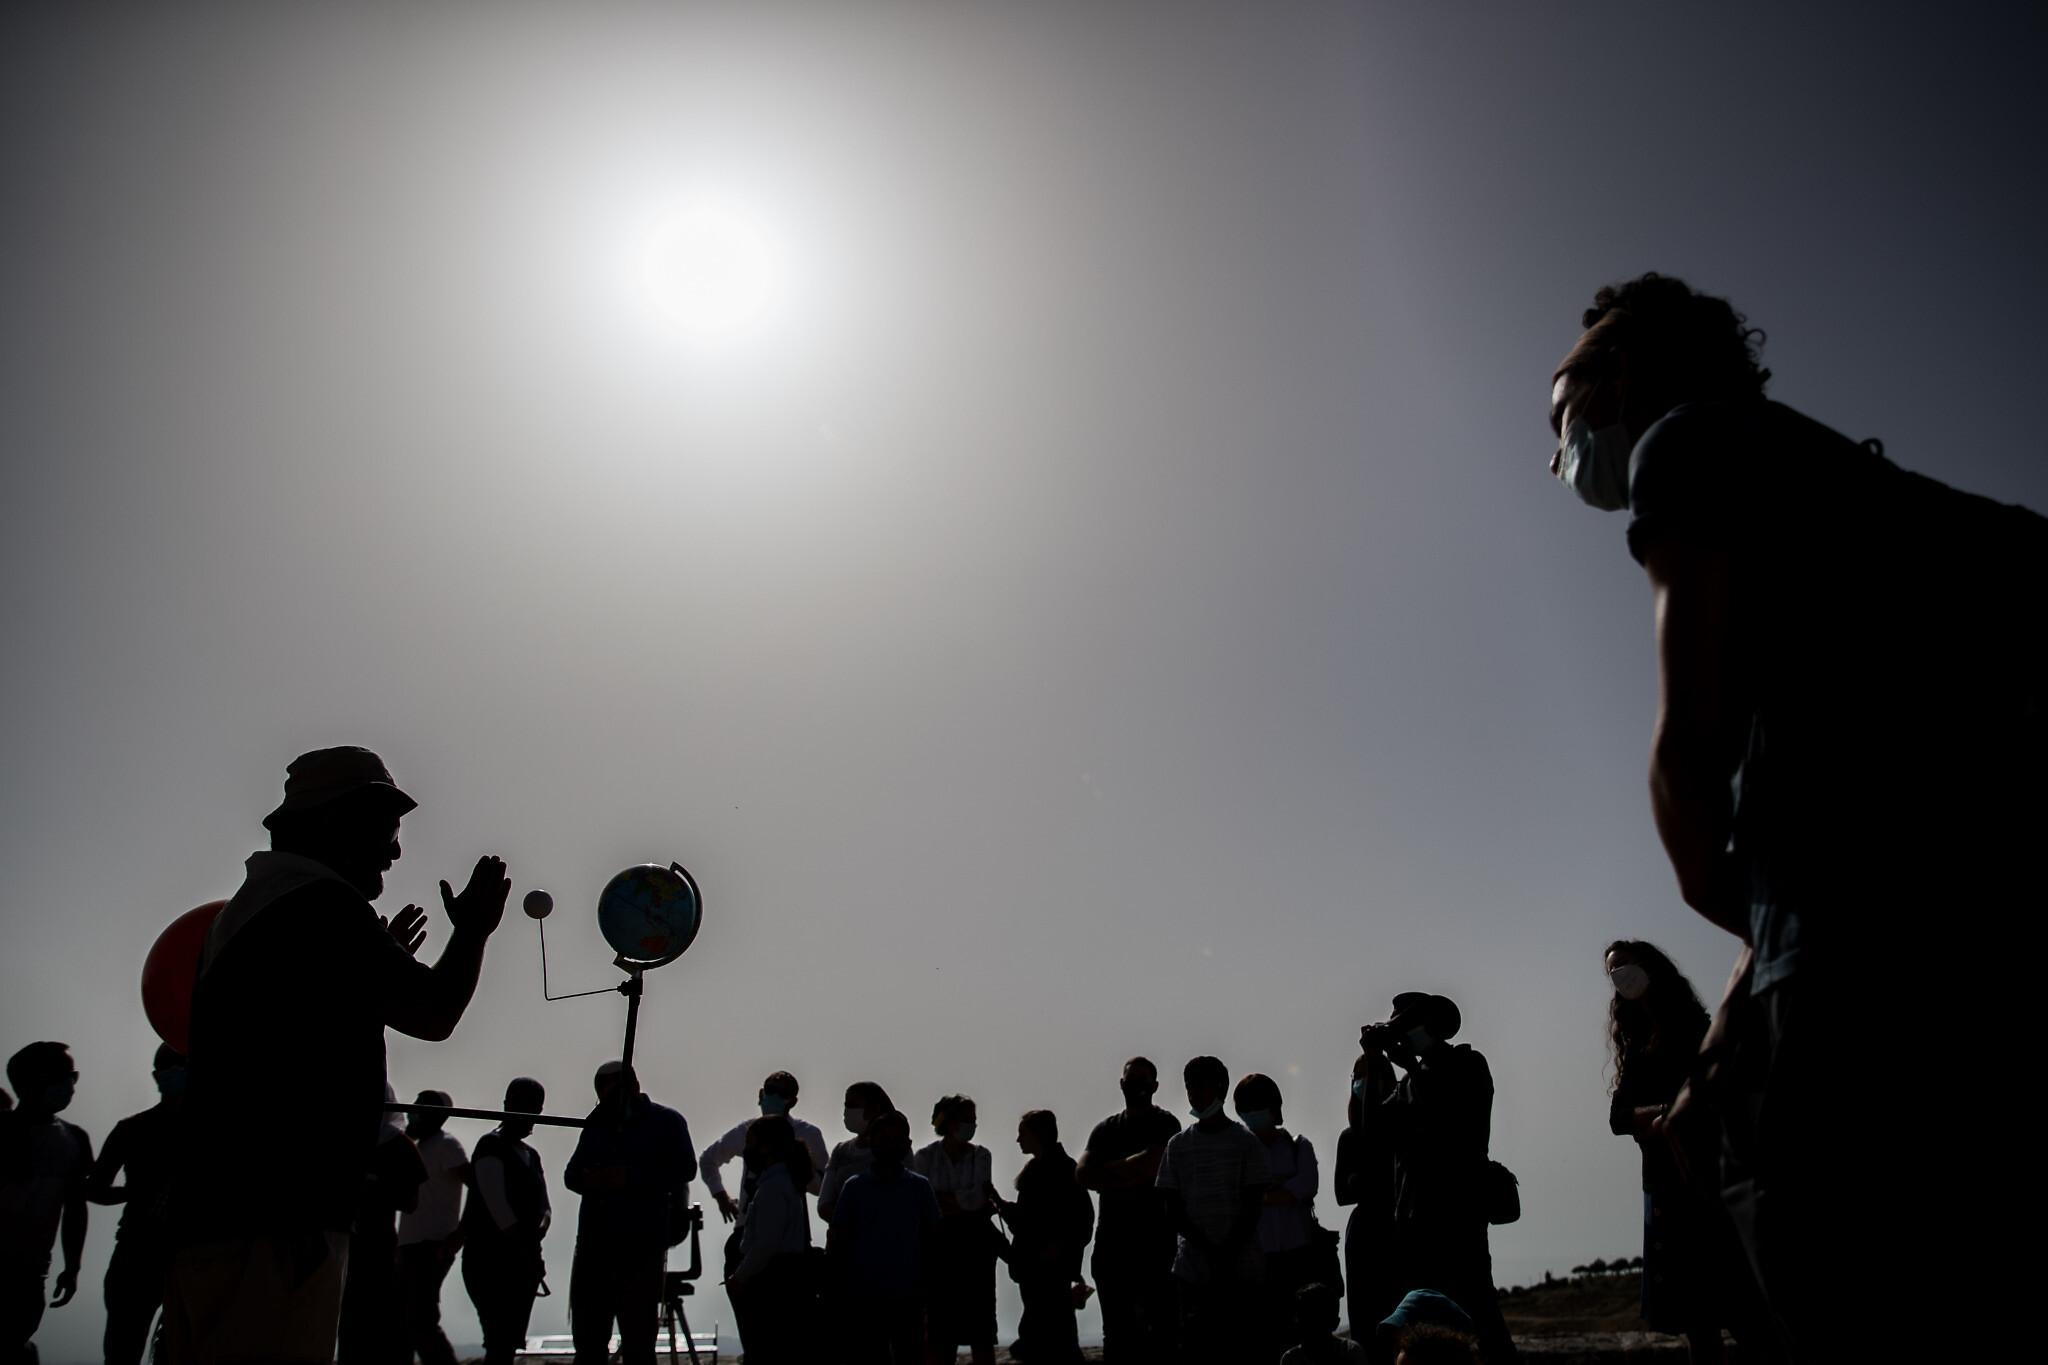 People observe a partial solar eclipse at Mount Scopus in Jerusalem on June 21, 2020. (Yonatan Sindel/Flash90)